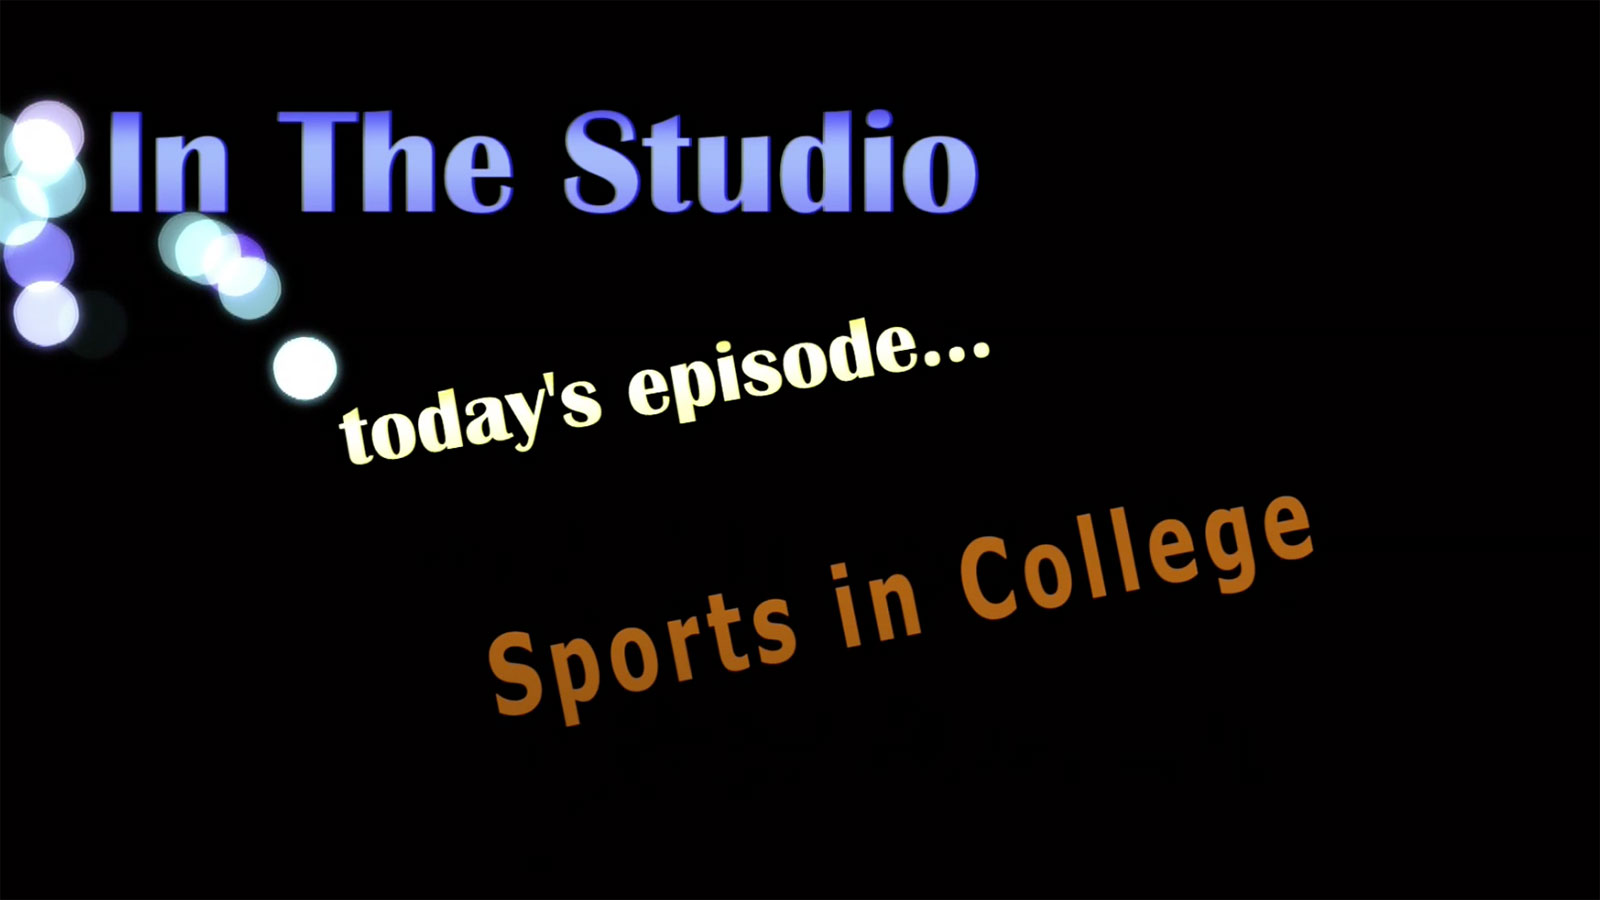 In the Studio: Sports in College